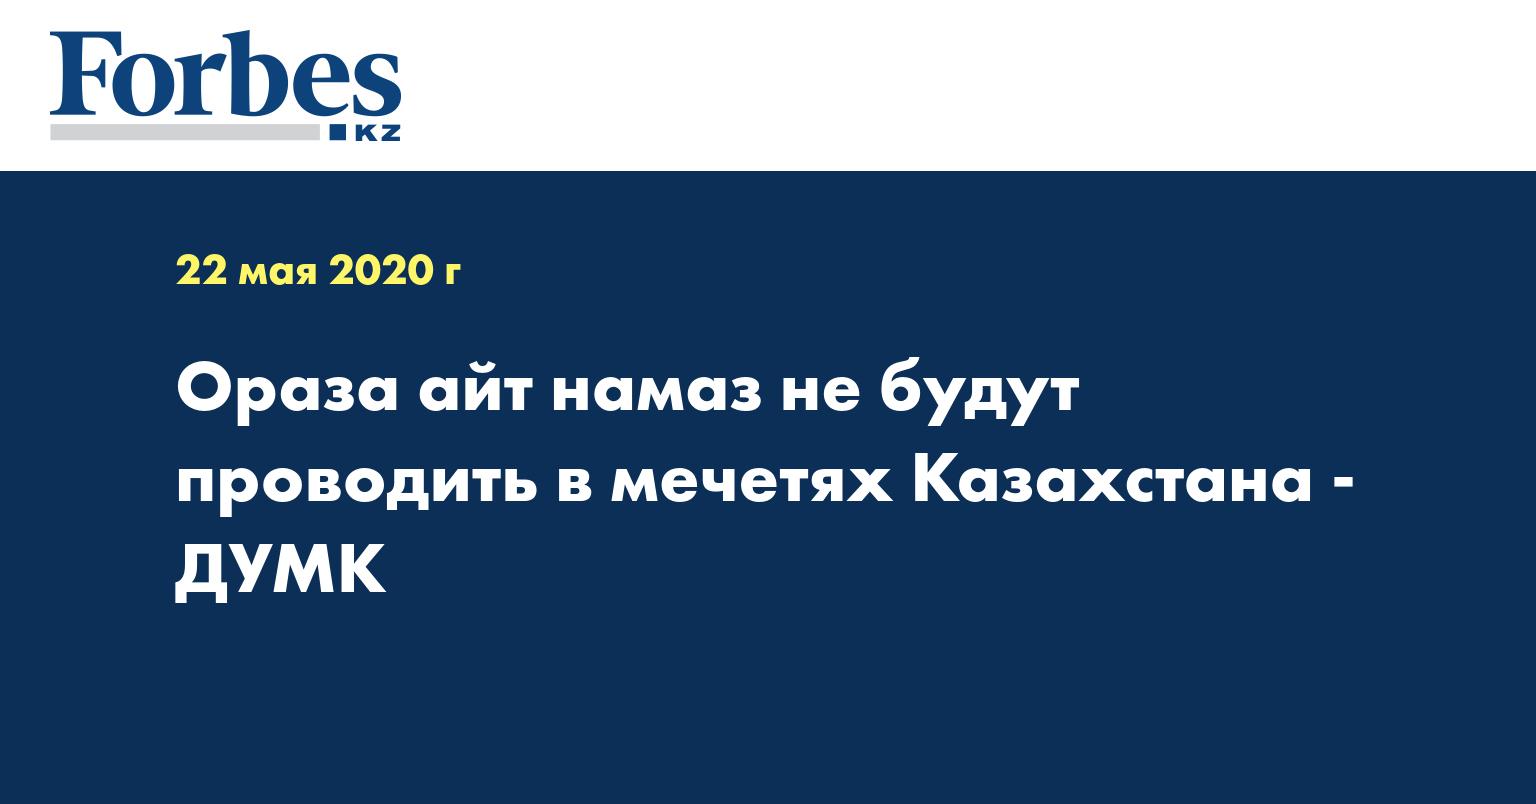 Ораза айт намаз не будут проводить в мечетях Казахстана  - ДУМК